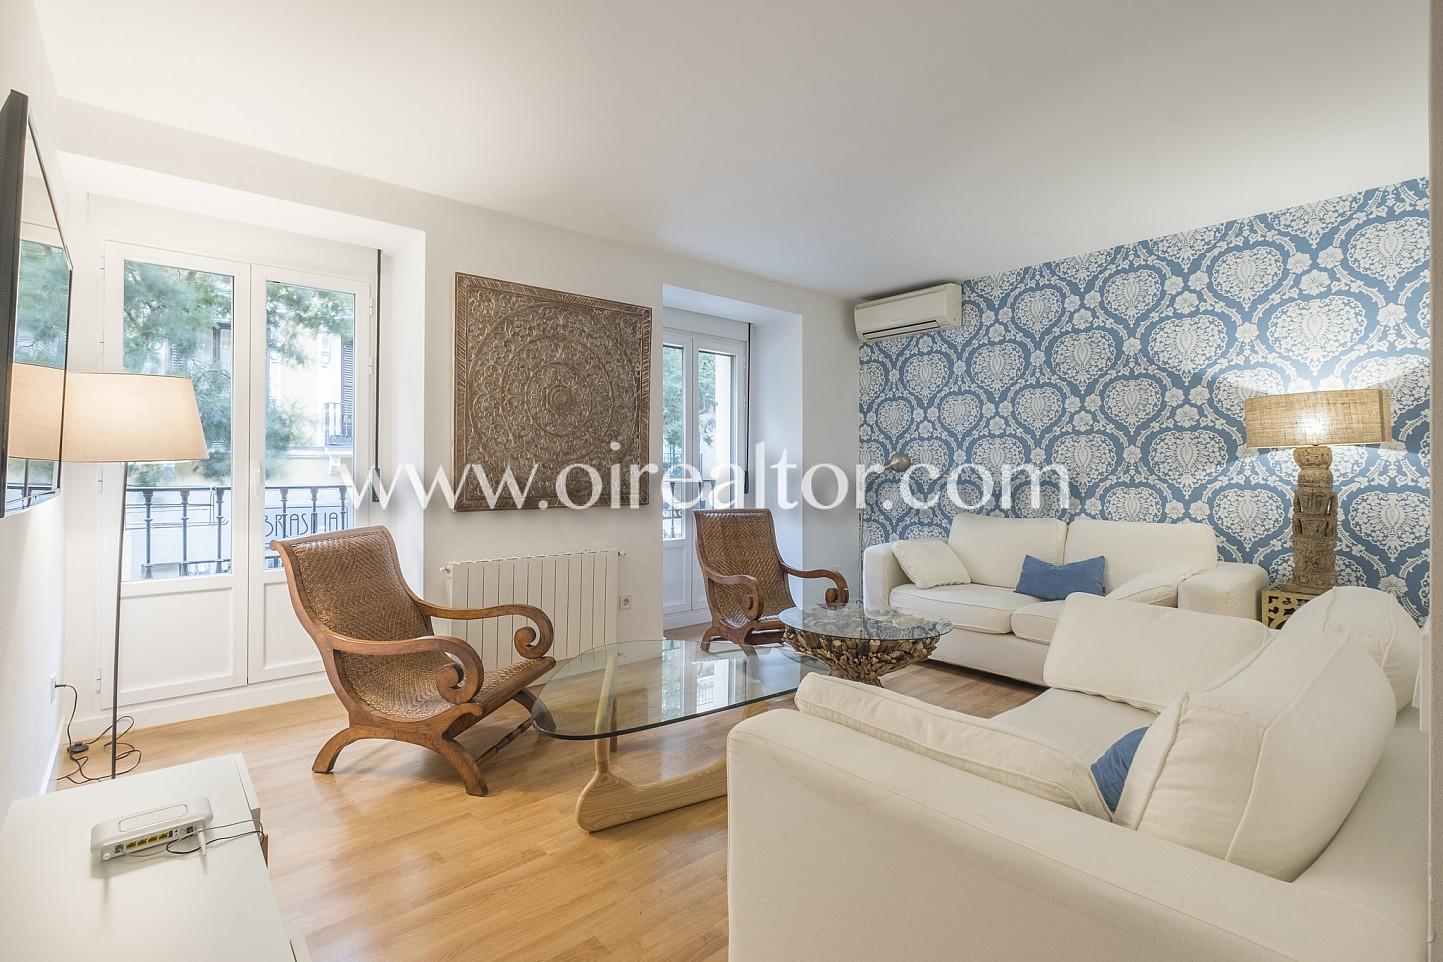 Exclusivo piso en centro de madrid oi realtor for Compartir piso madrid centro